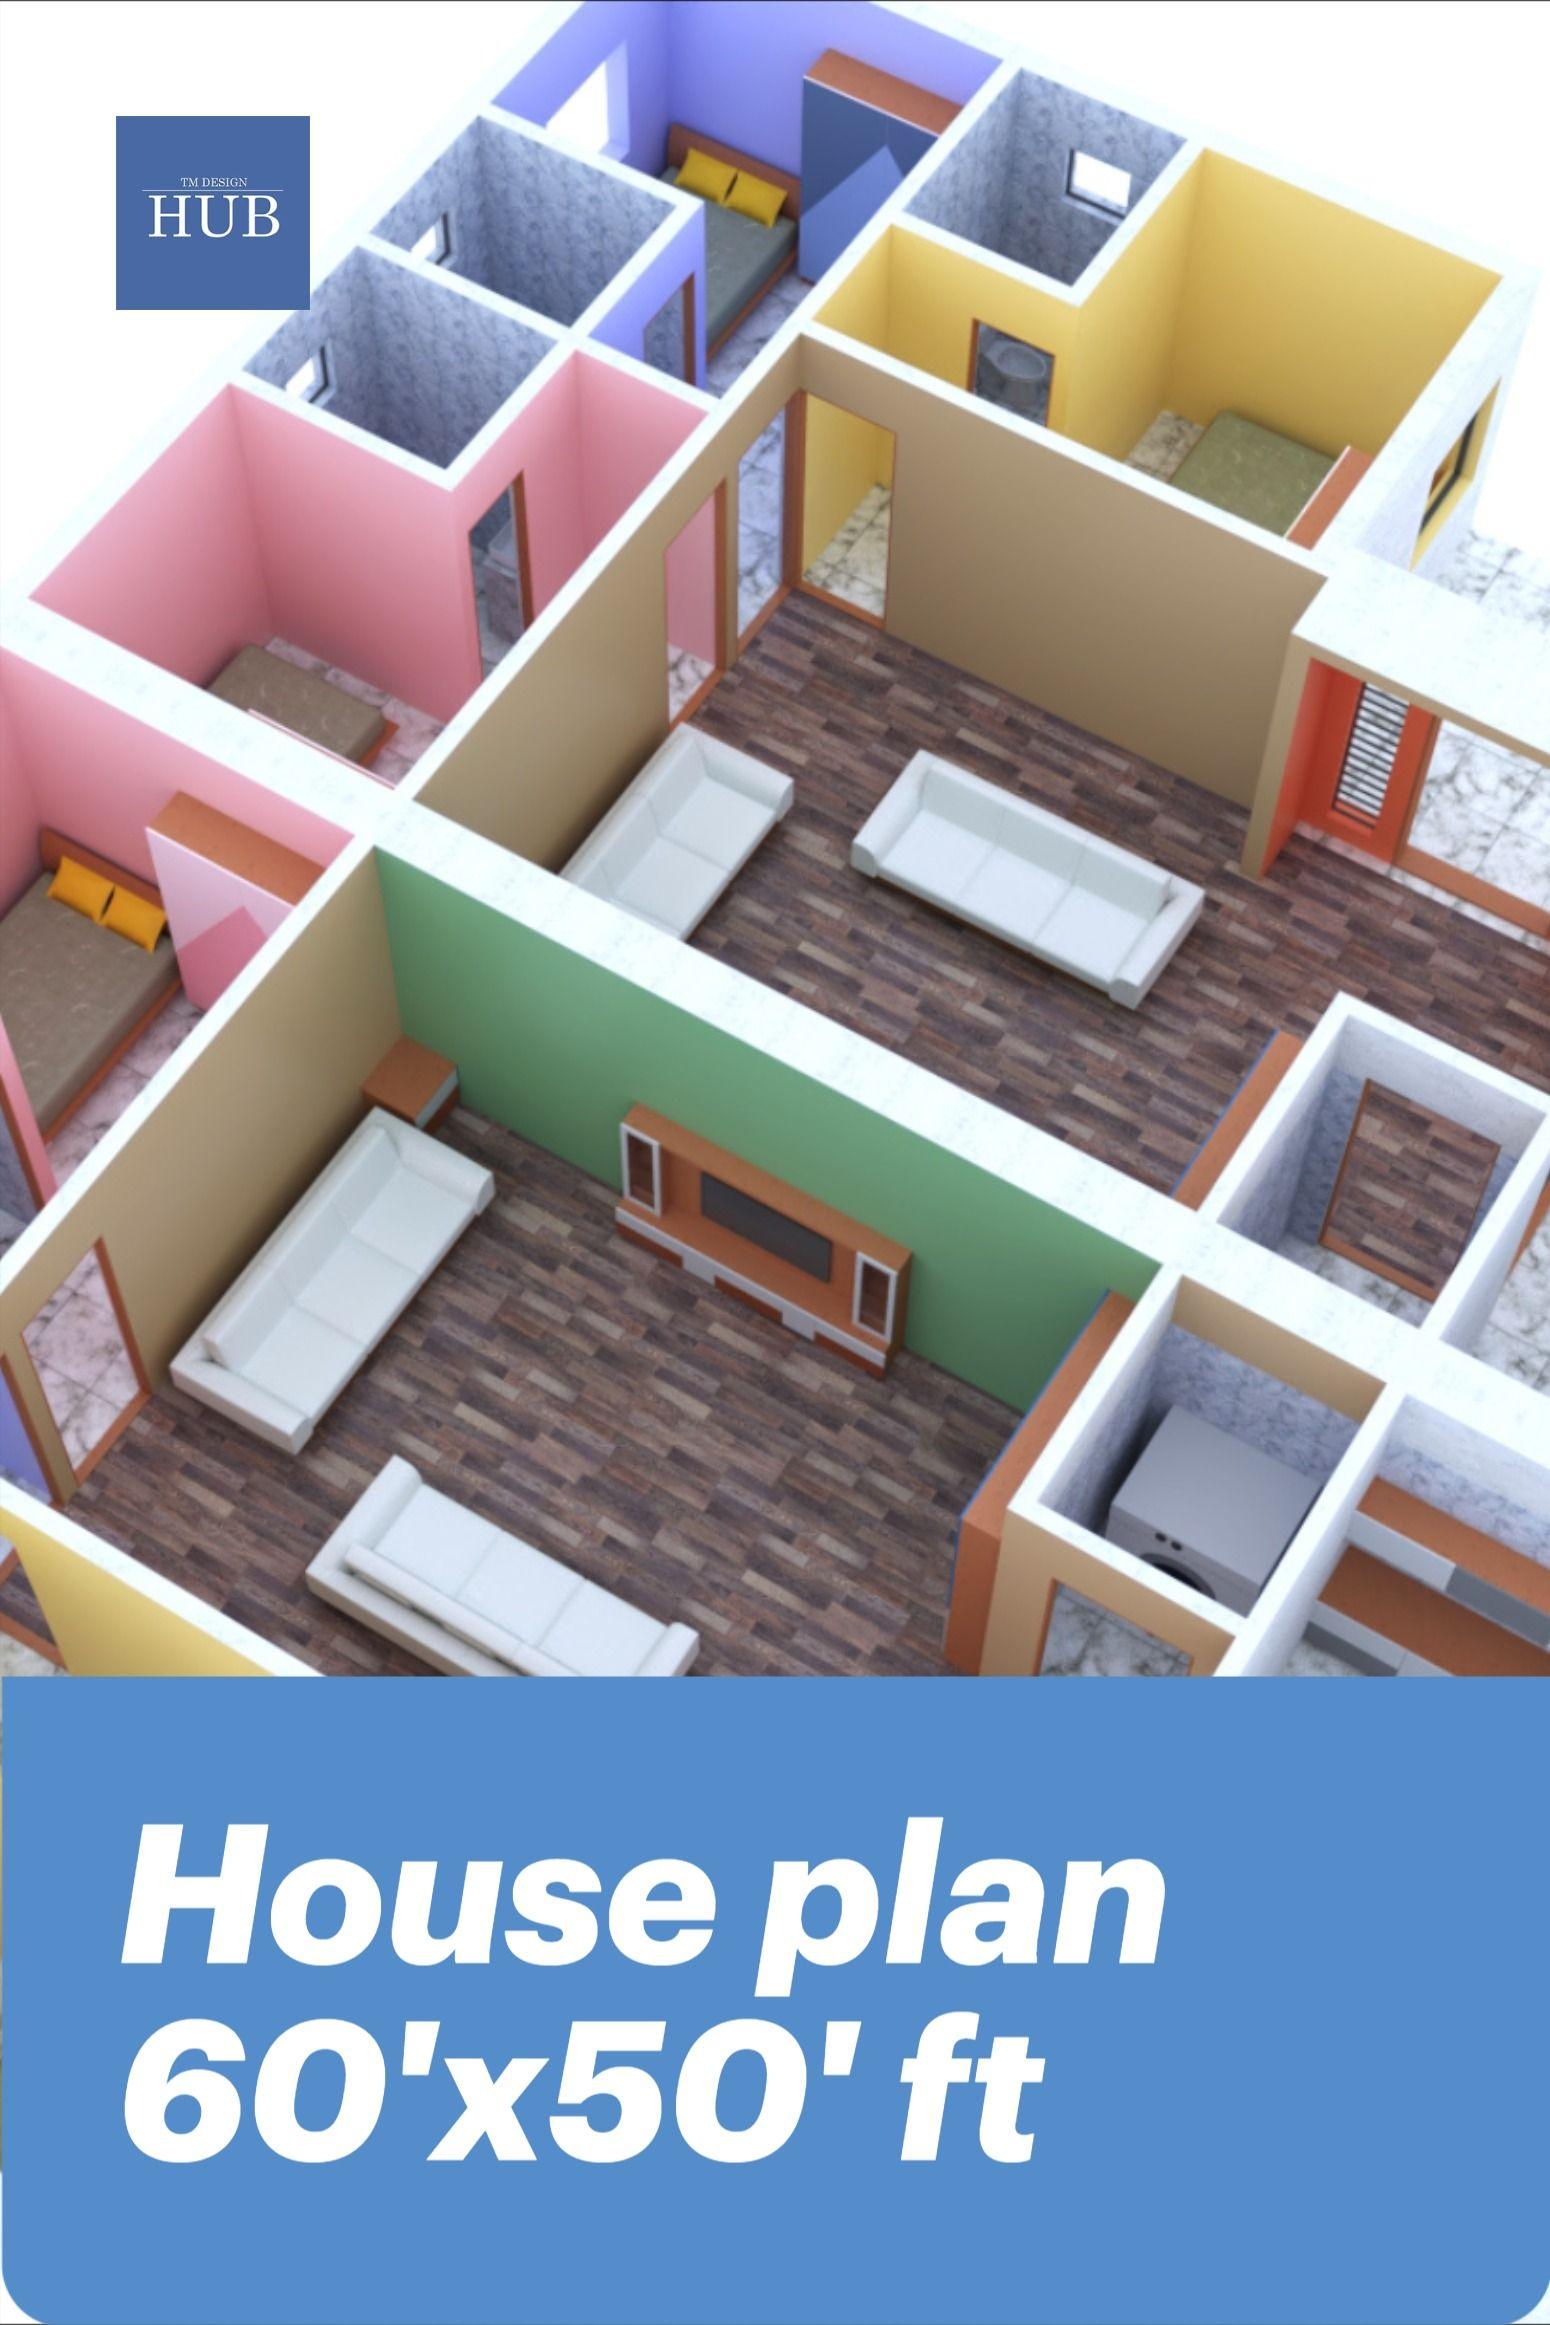 Home Design 60 X50 Ft Plan House Plans House Design Design